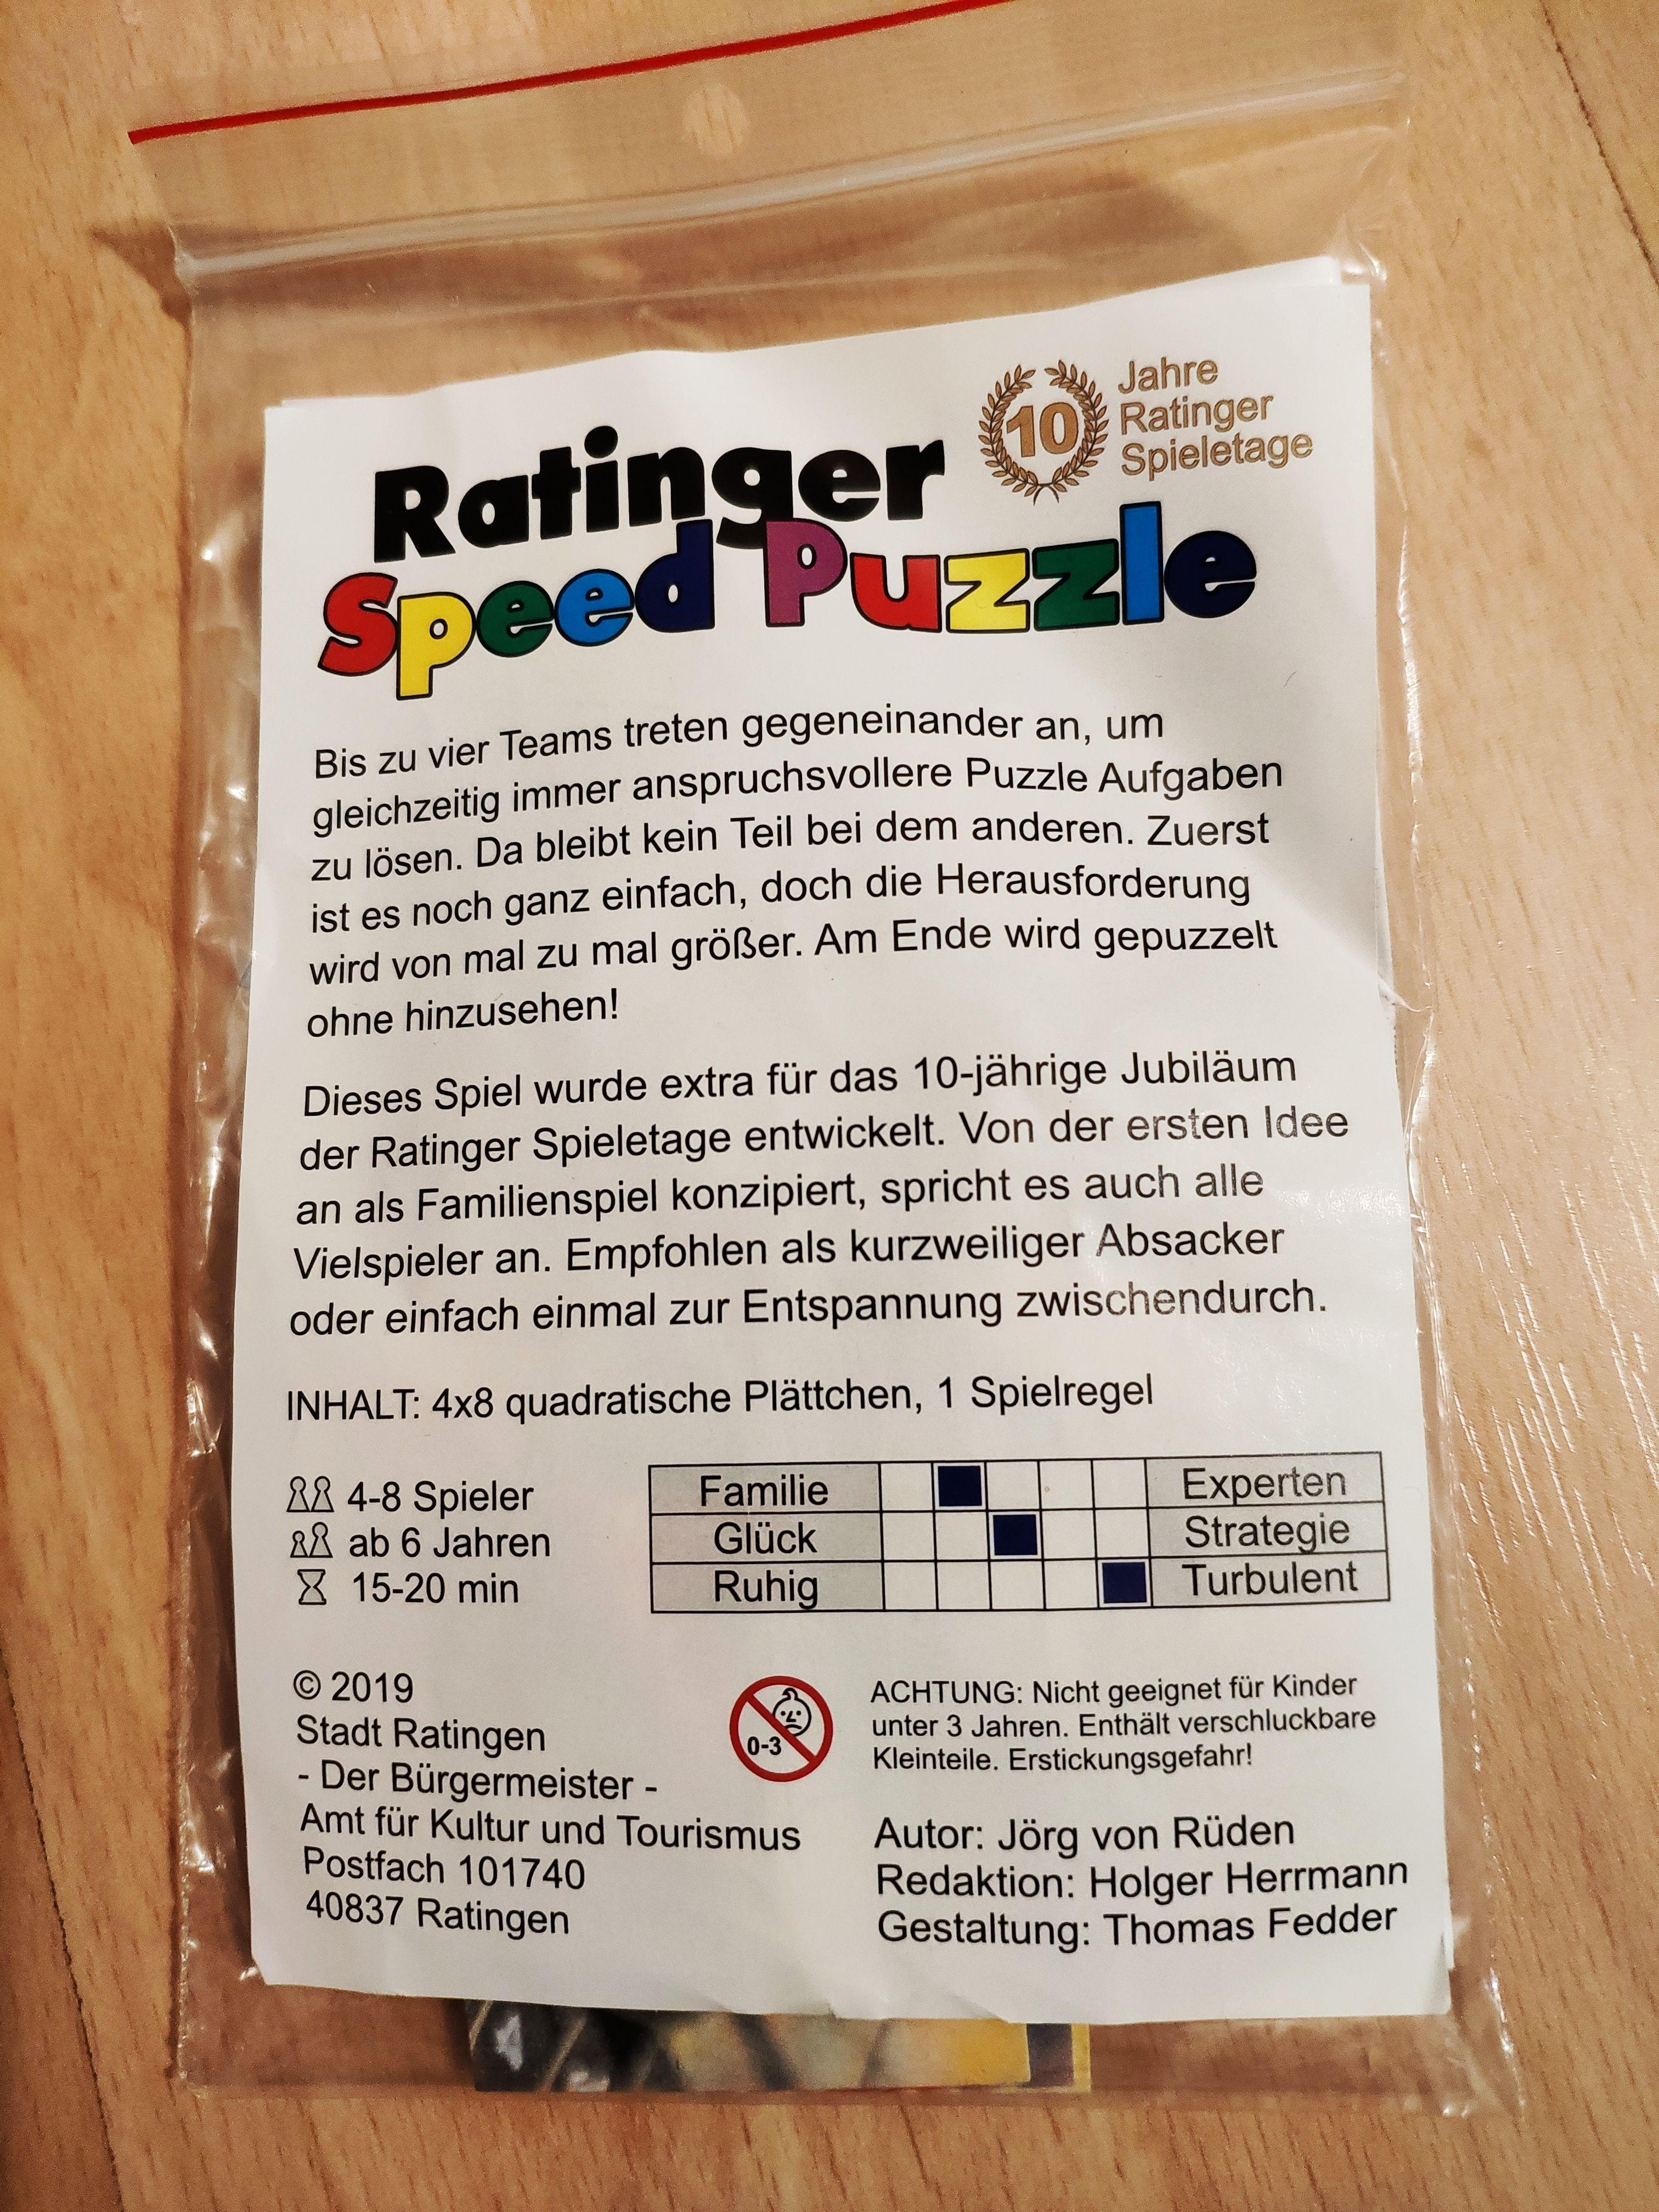 Ratinger Speed Puzzle